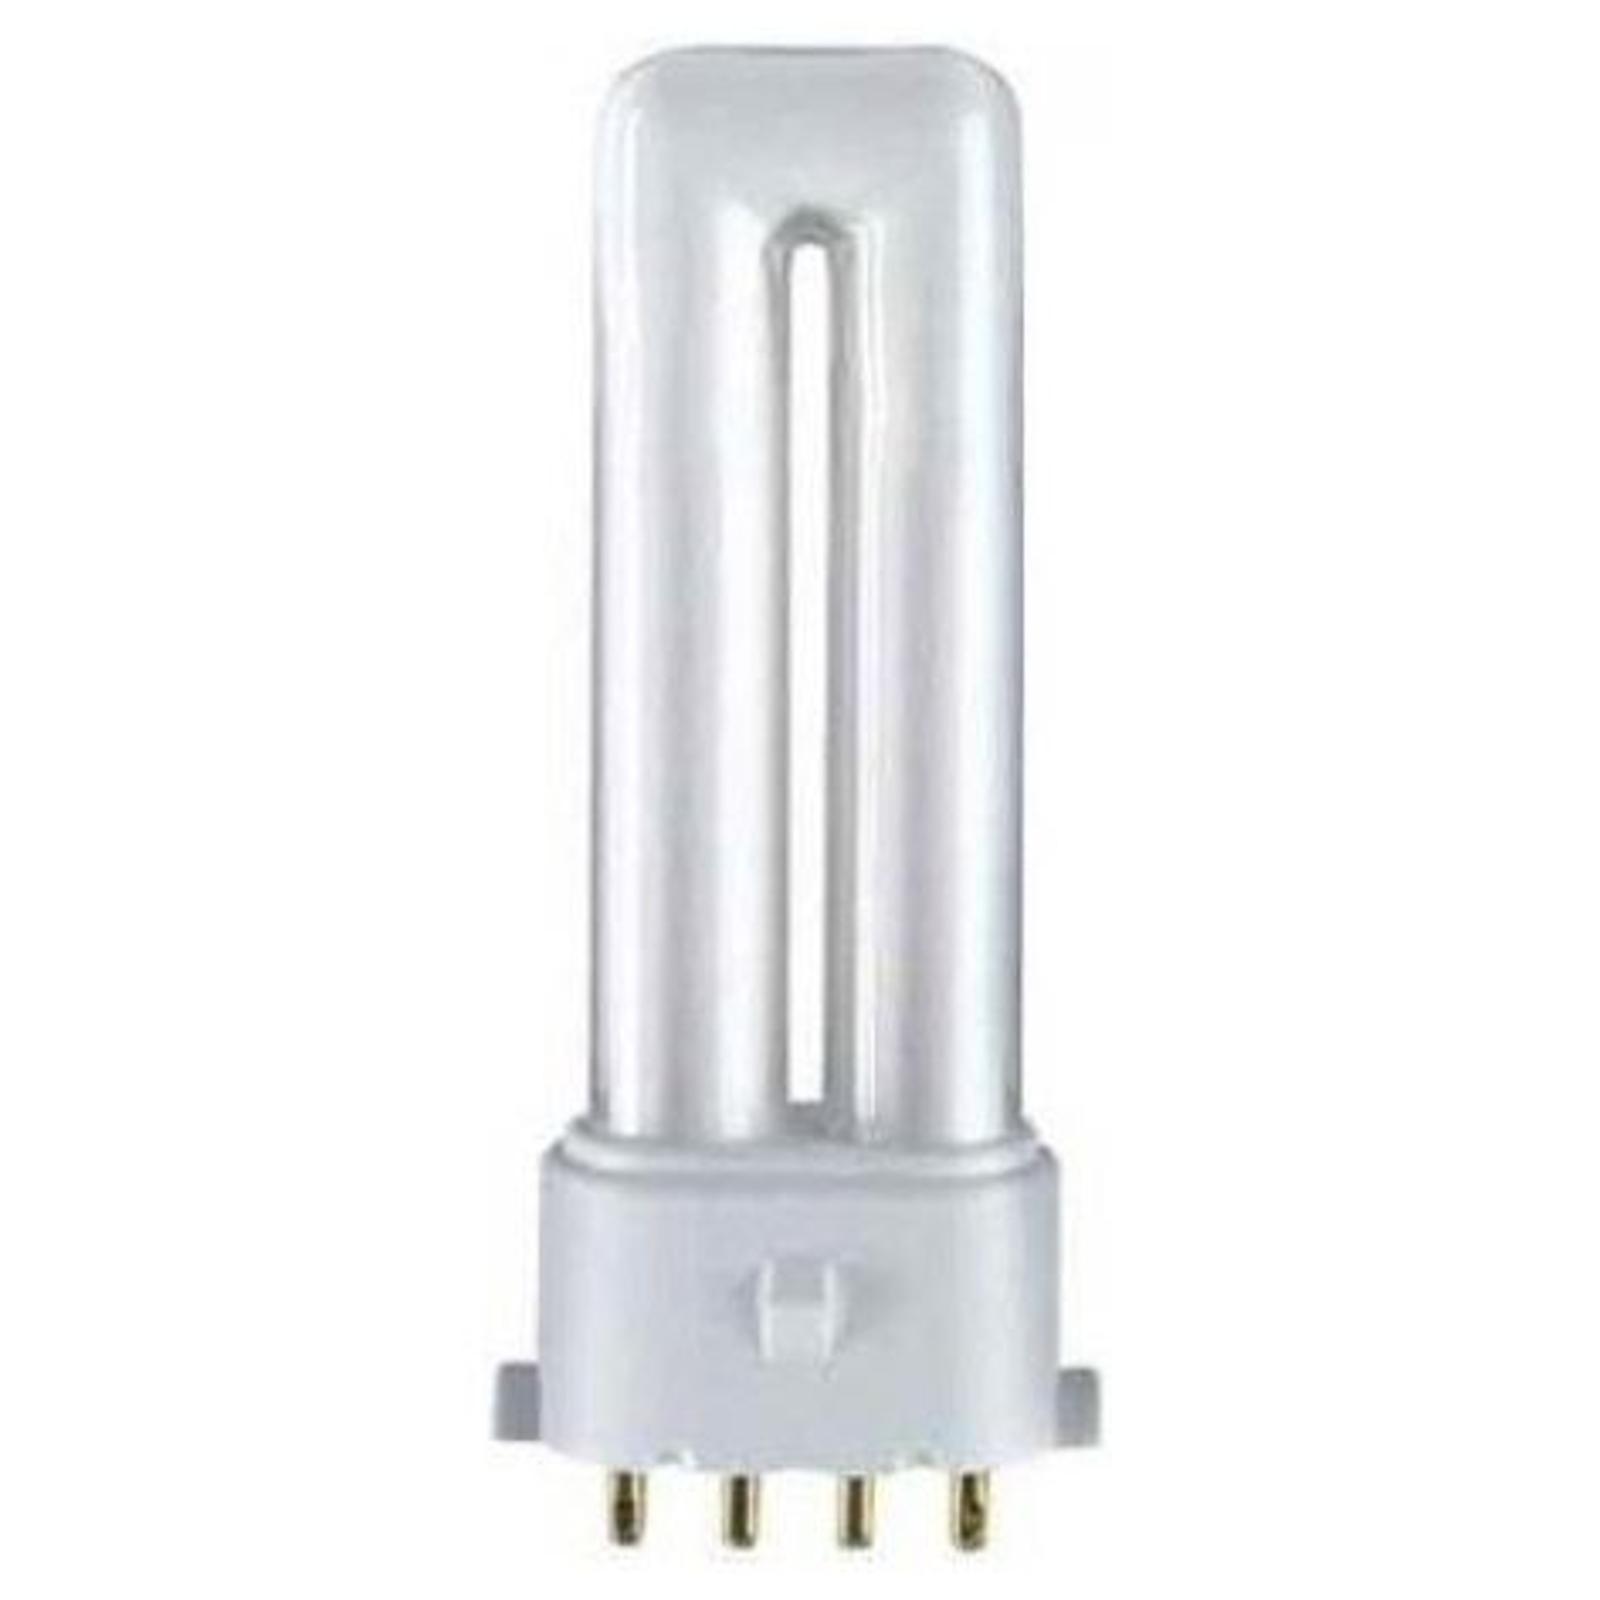 2G7 Kompaktleuchtstofflampe PHILIPS Master 4Pin